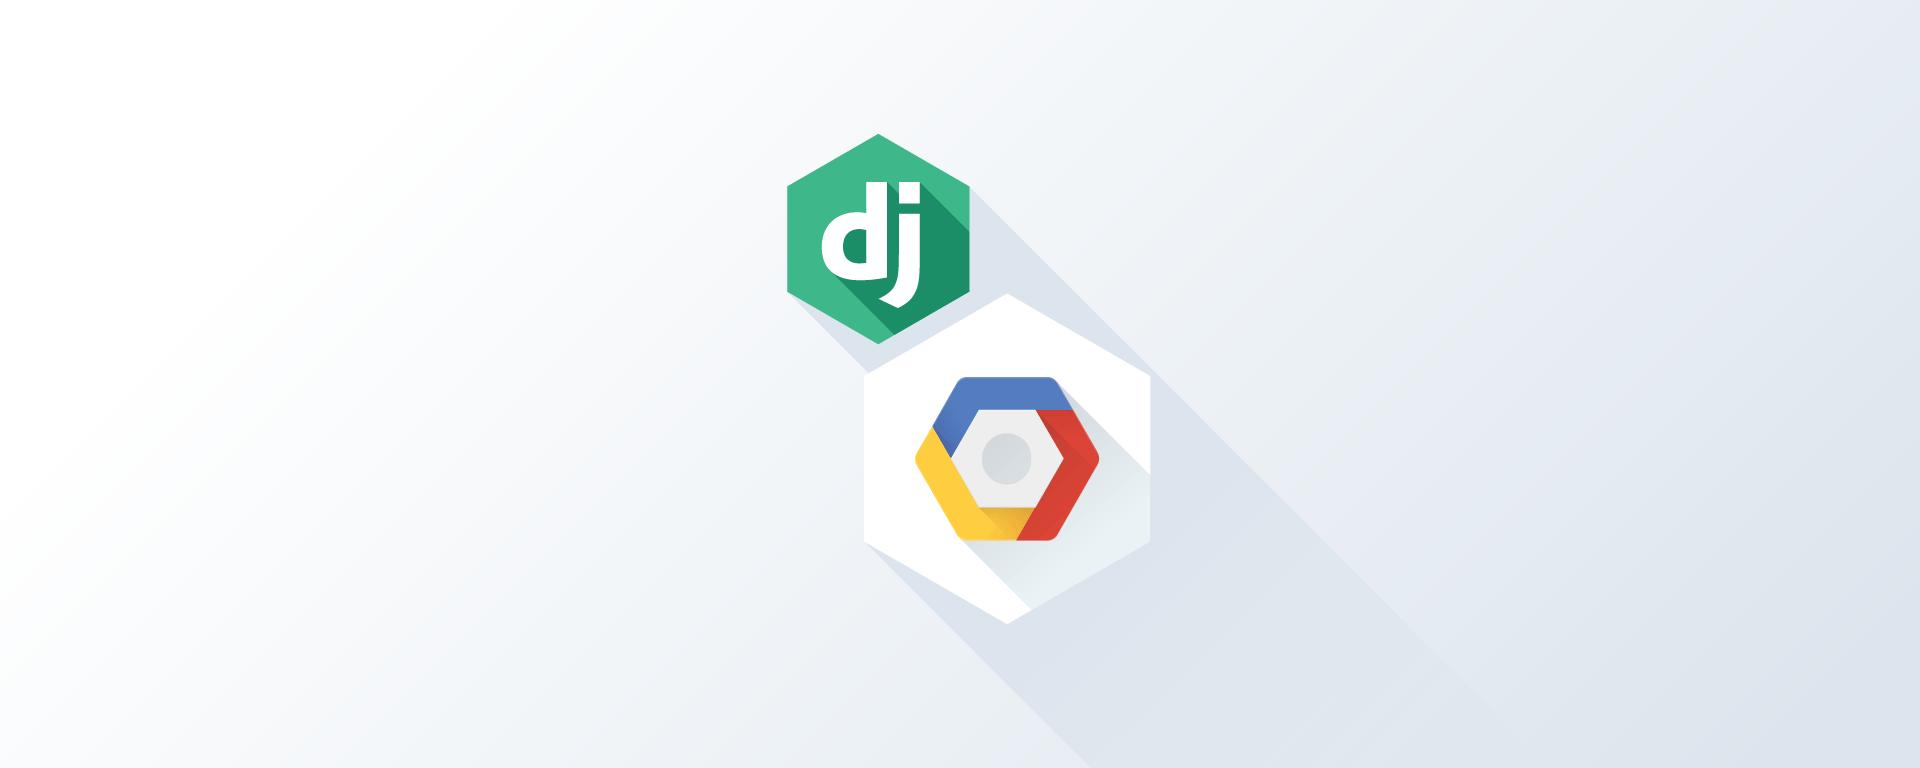 Using Cookiecutter-django with Google Cloud Storage